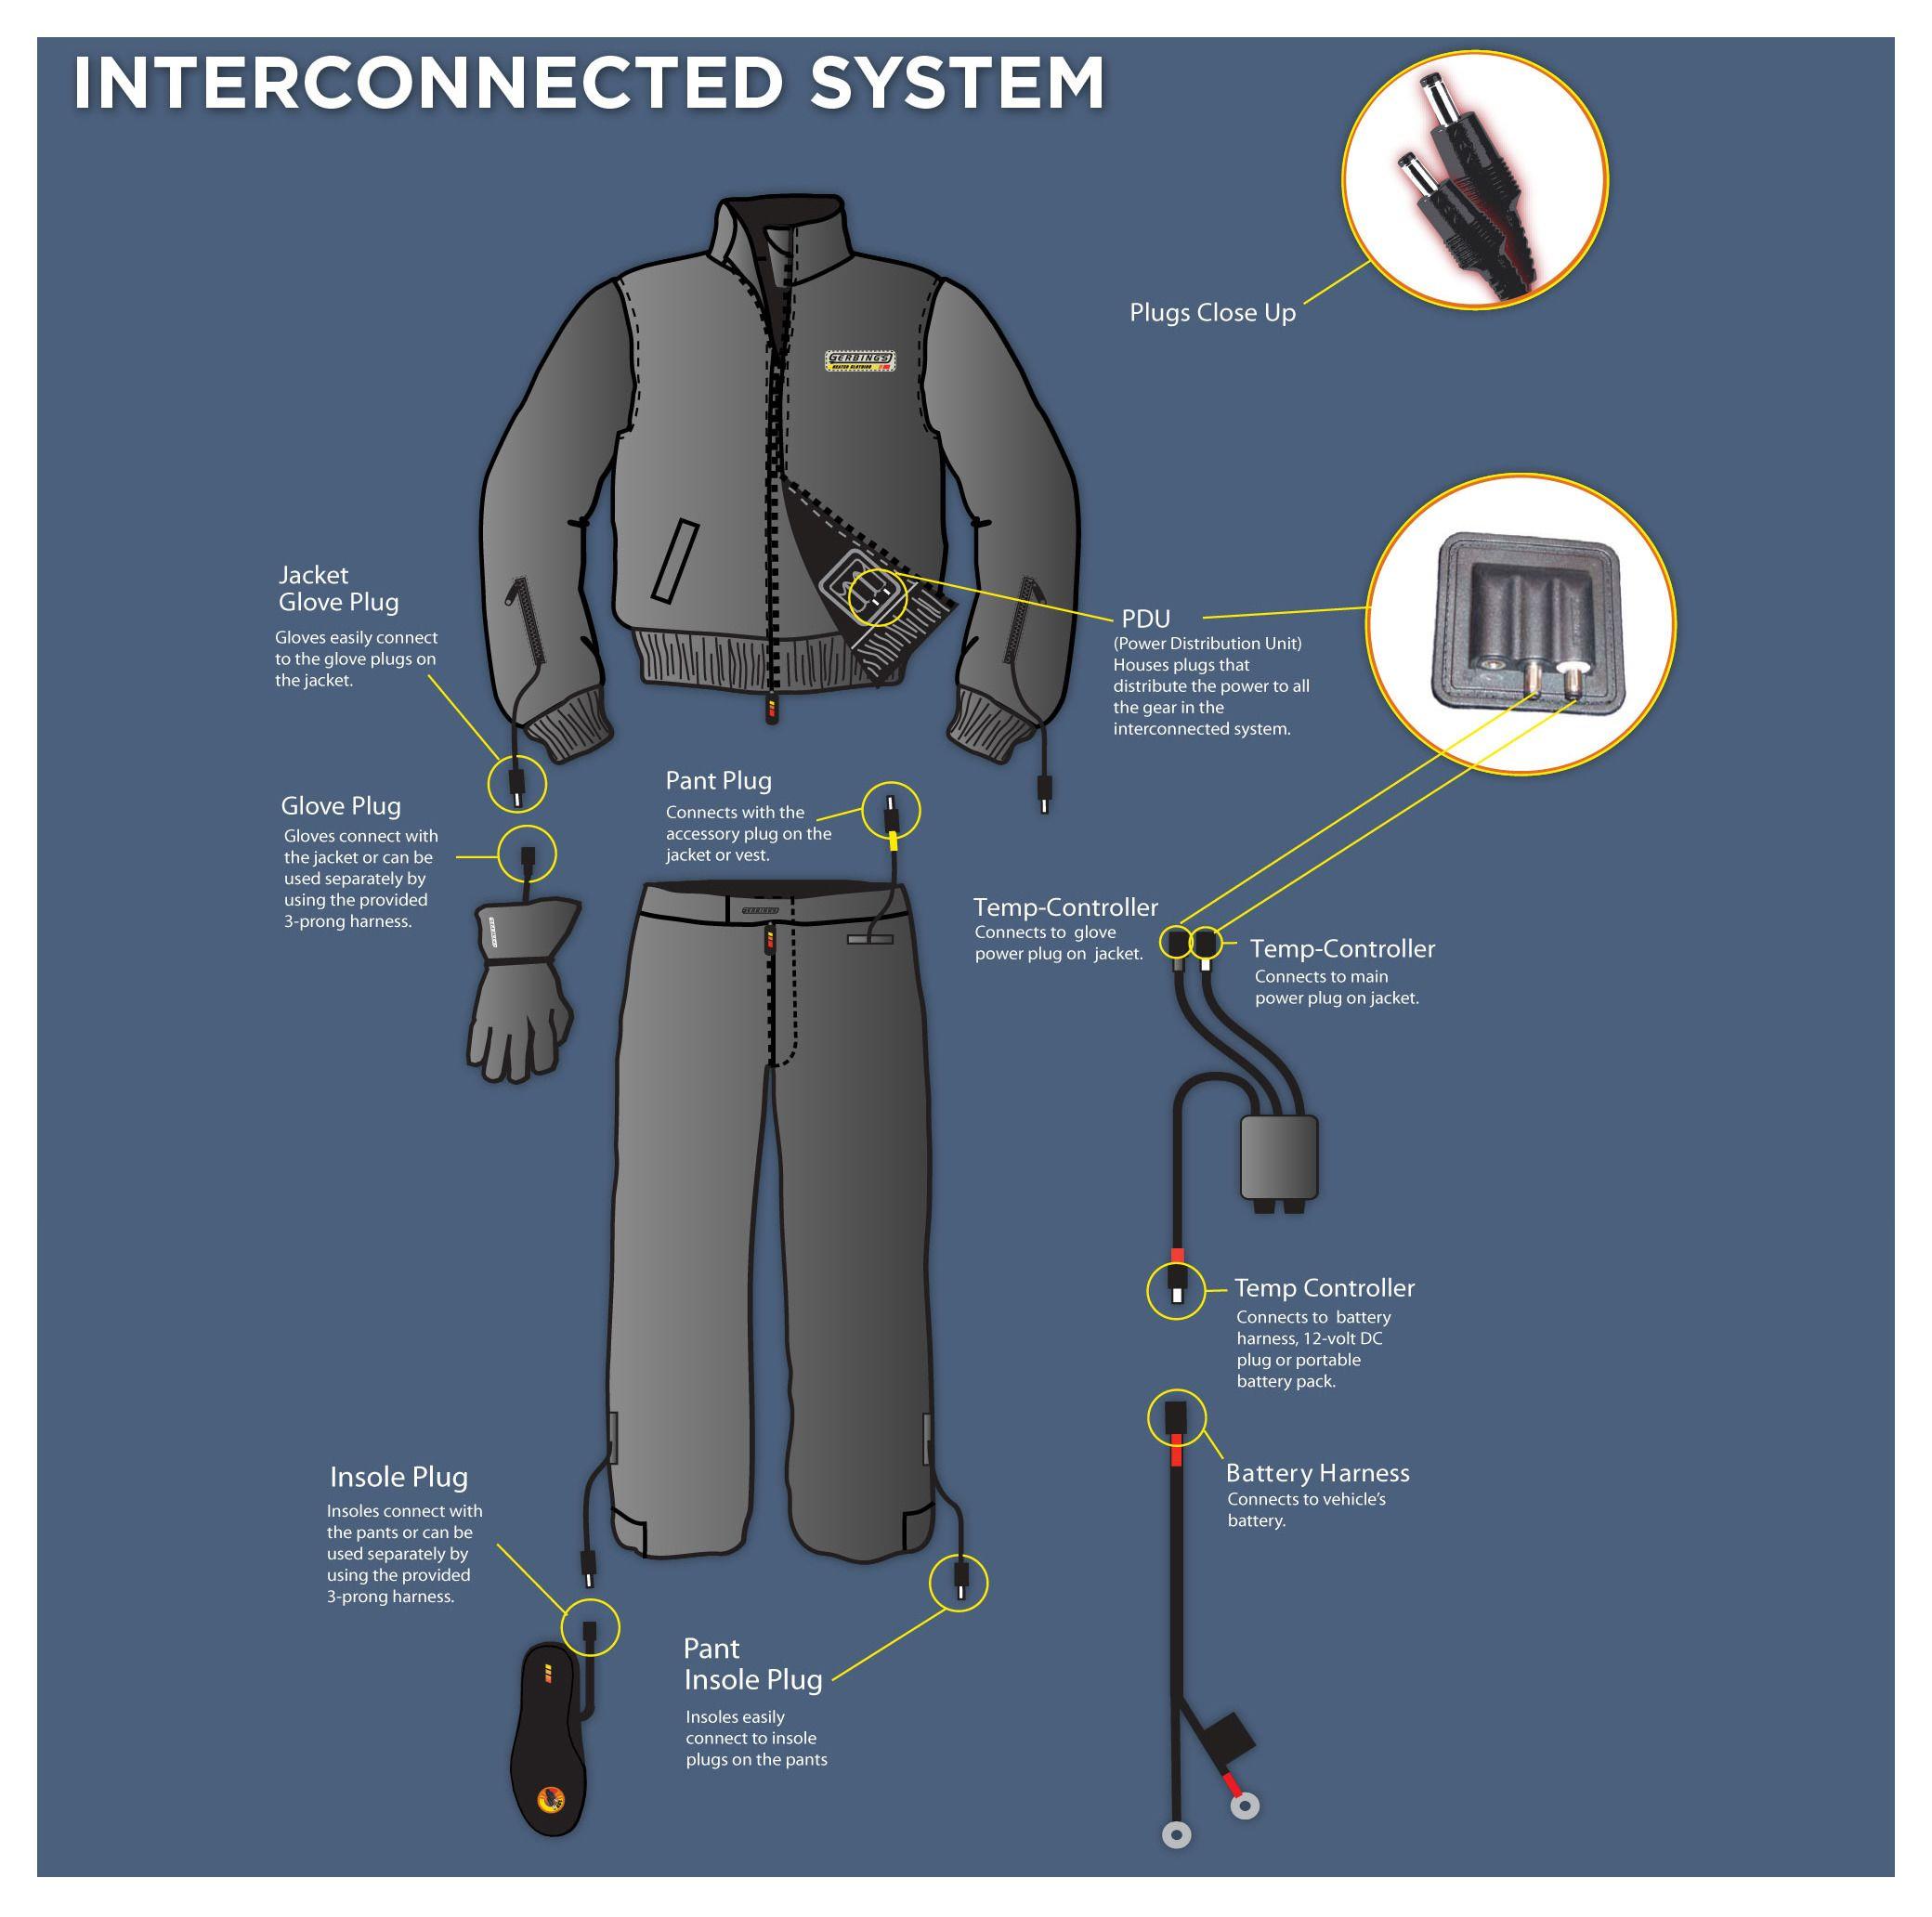 Gerbing Heated Clothing Wiring Diagram Opinions About Battery Of A Gator 12v Socks Revzilla Rh Com John Deere Cigarette Lighter Socket